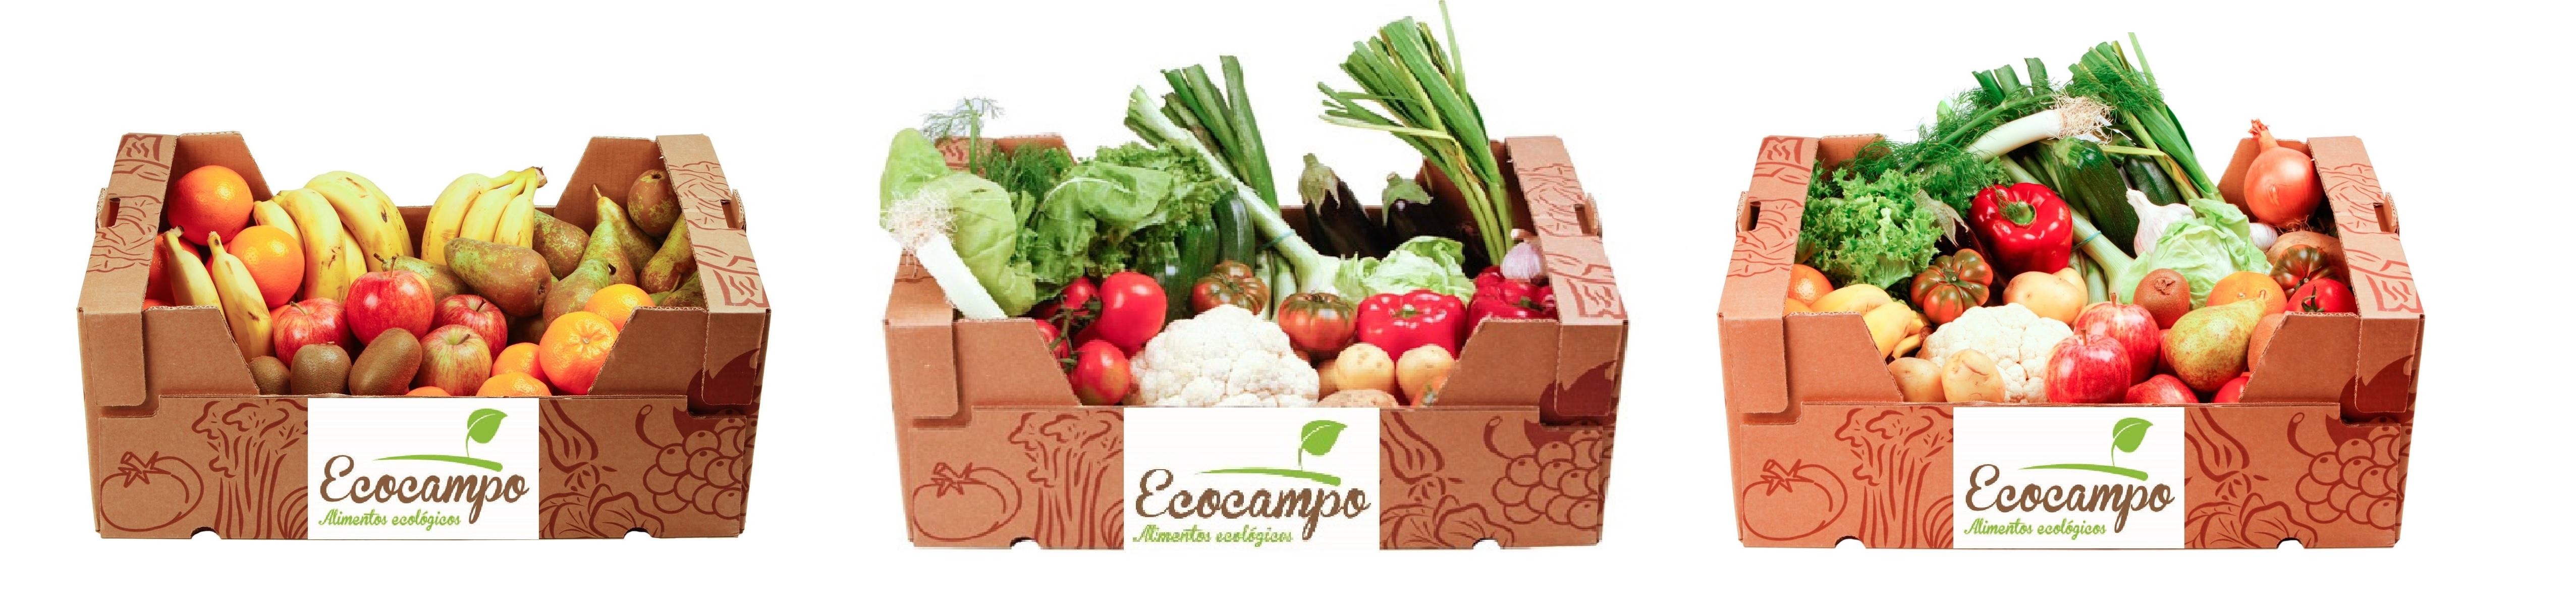 Ecocampo una garant a de salud lachefa for Rotacion cultivos agricultura ecologica